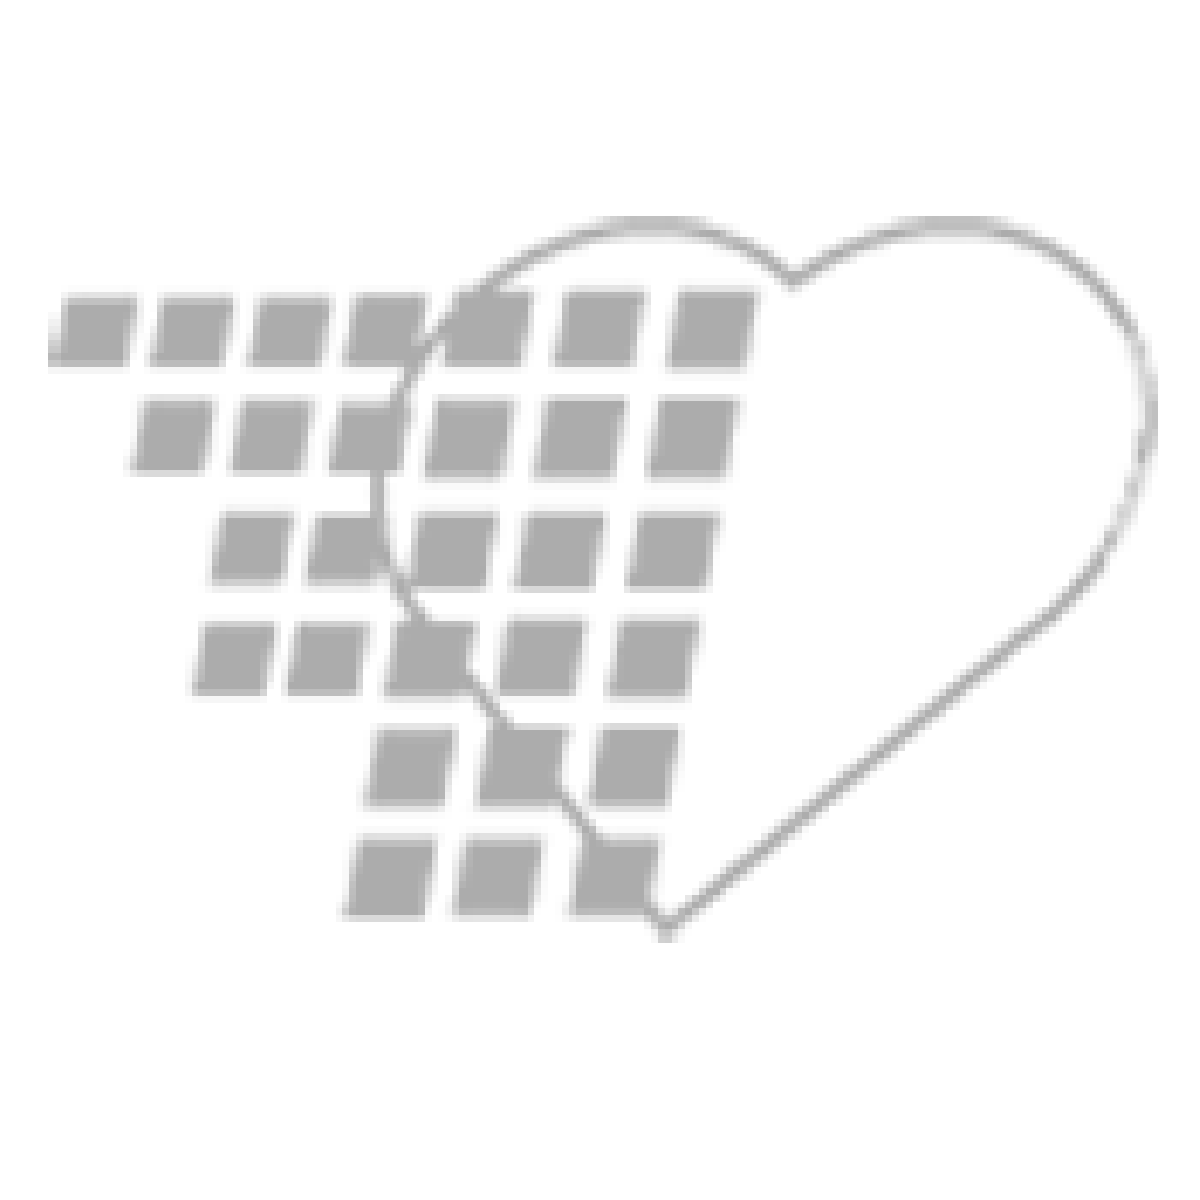 05-59-6250 Argyle™ Sterile Water - 100 mL